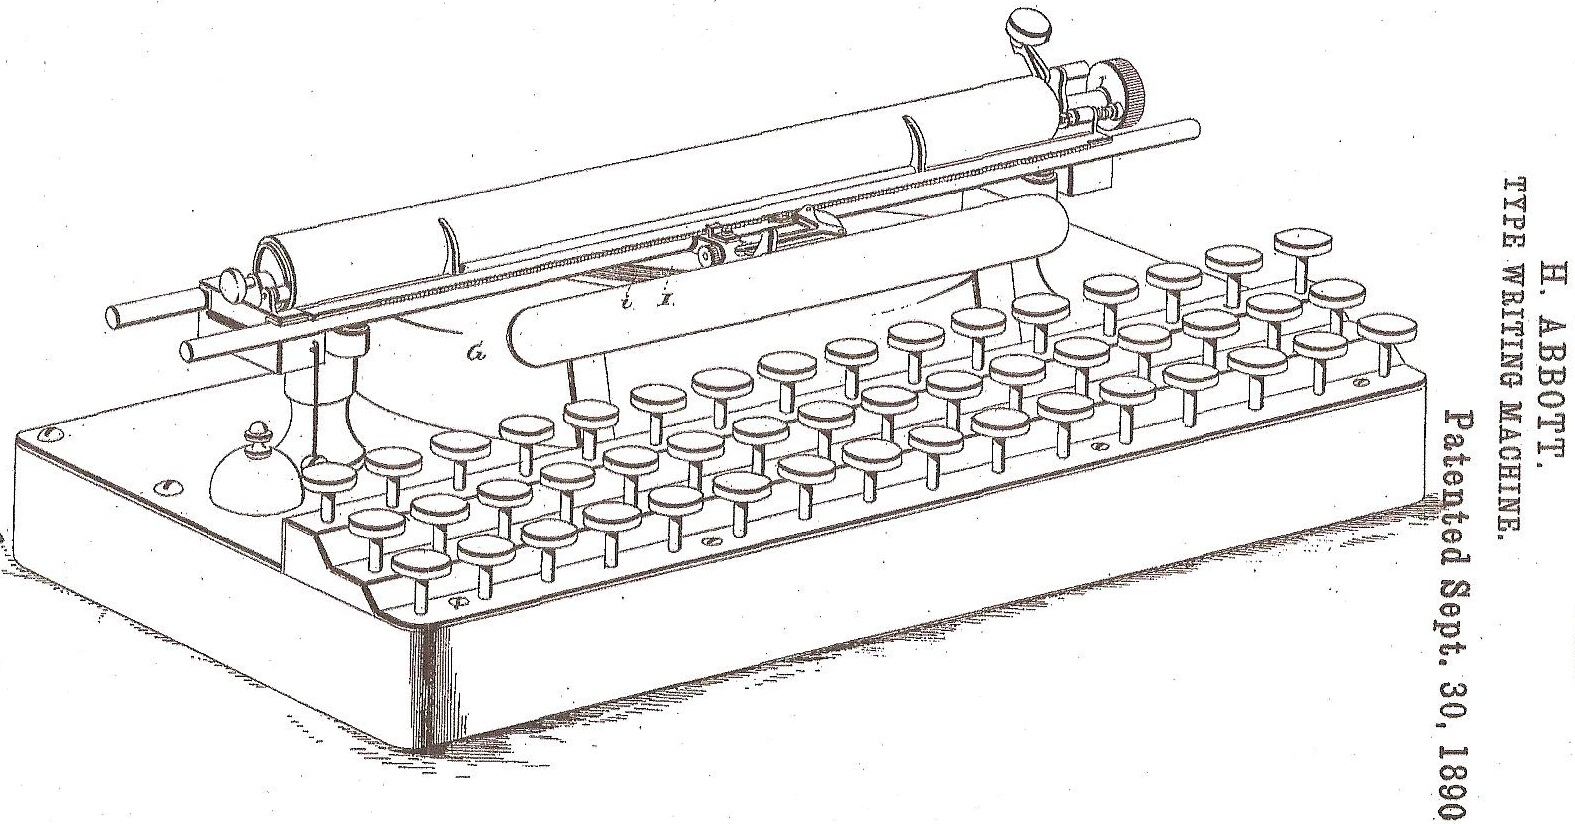 Oz Typewriter On This Day In Typewriter Historyv